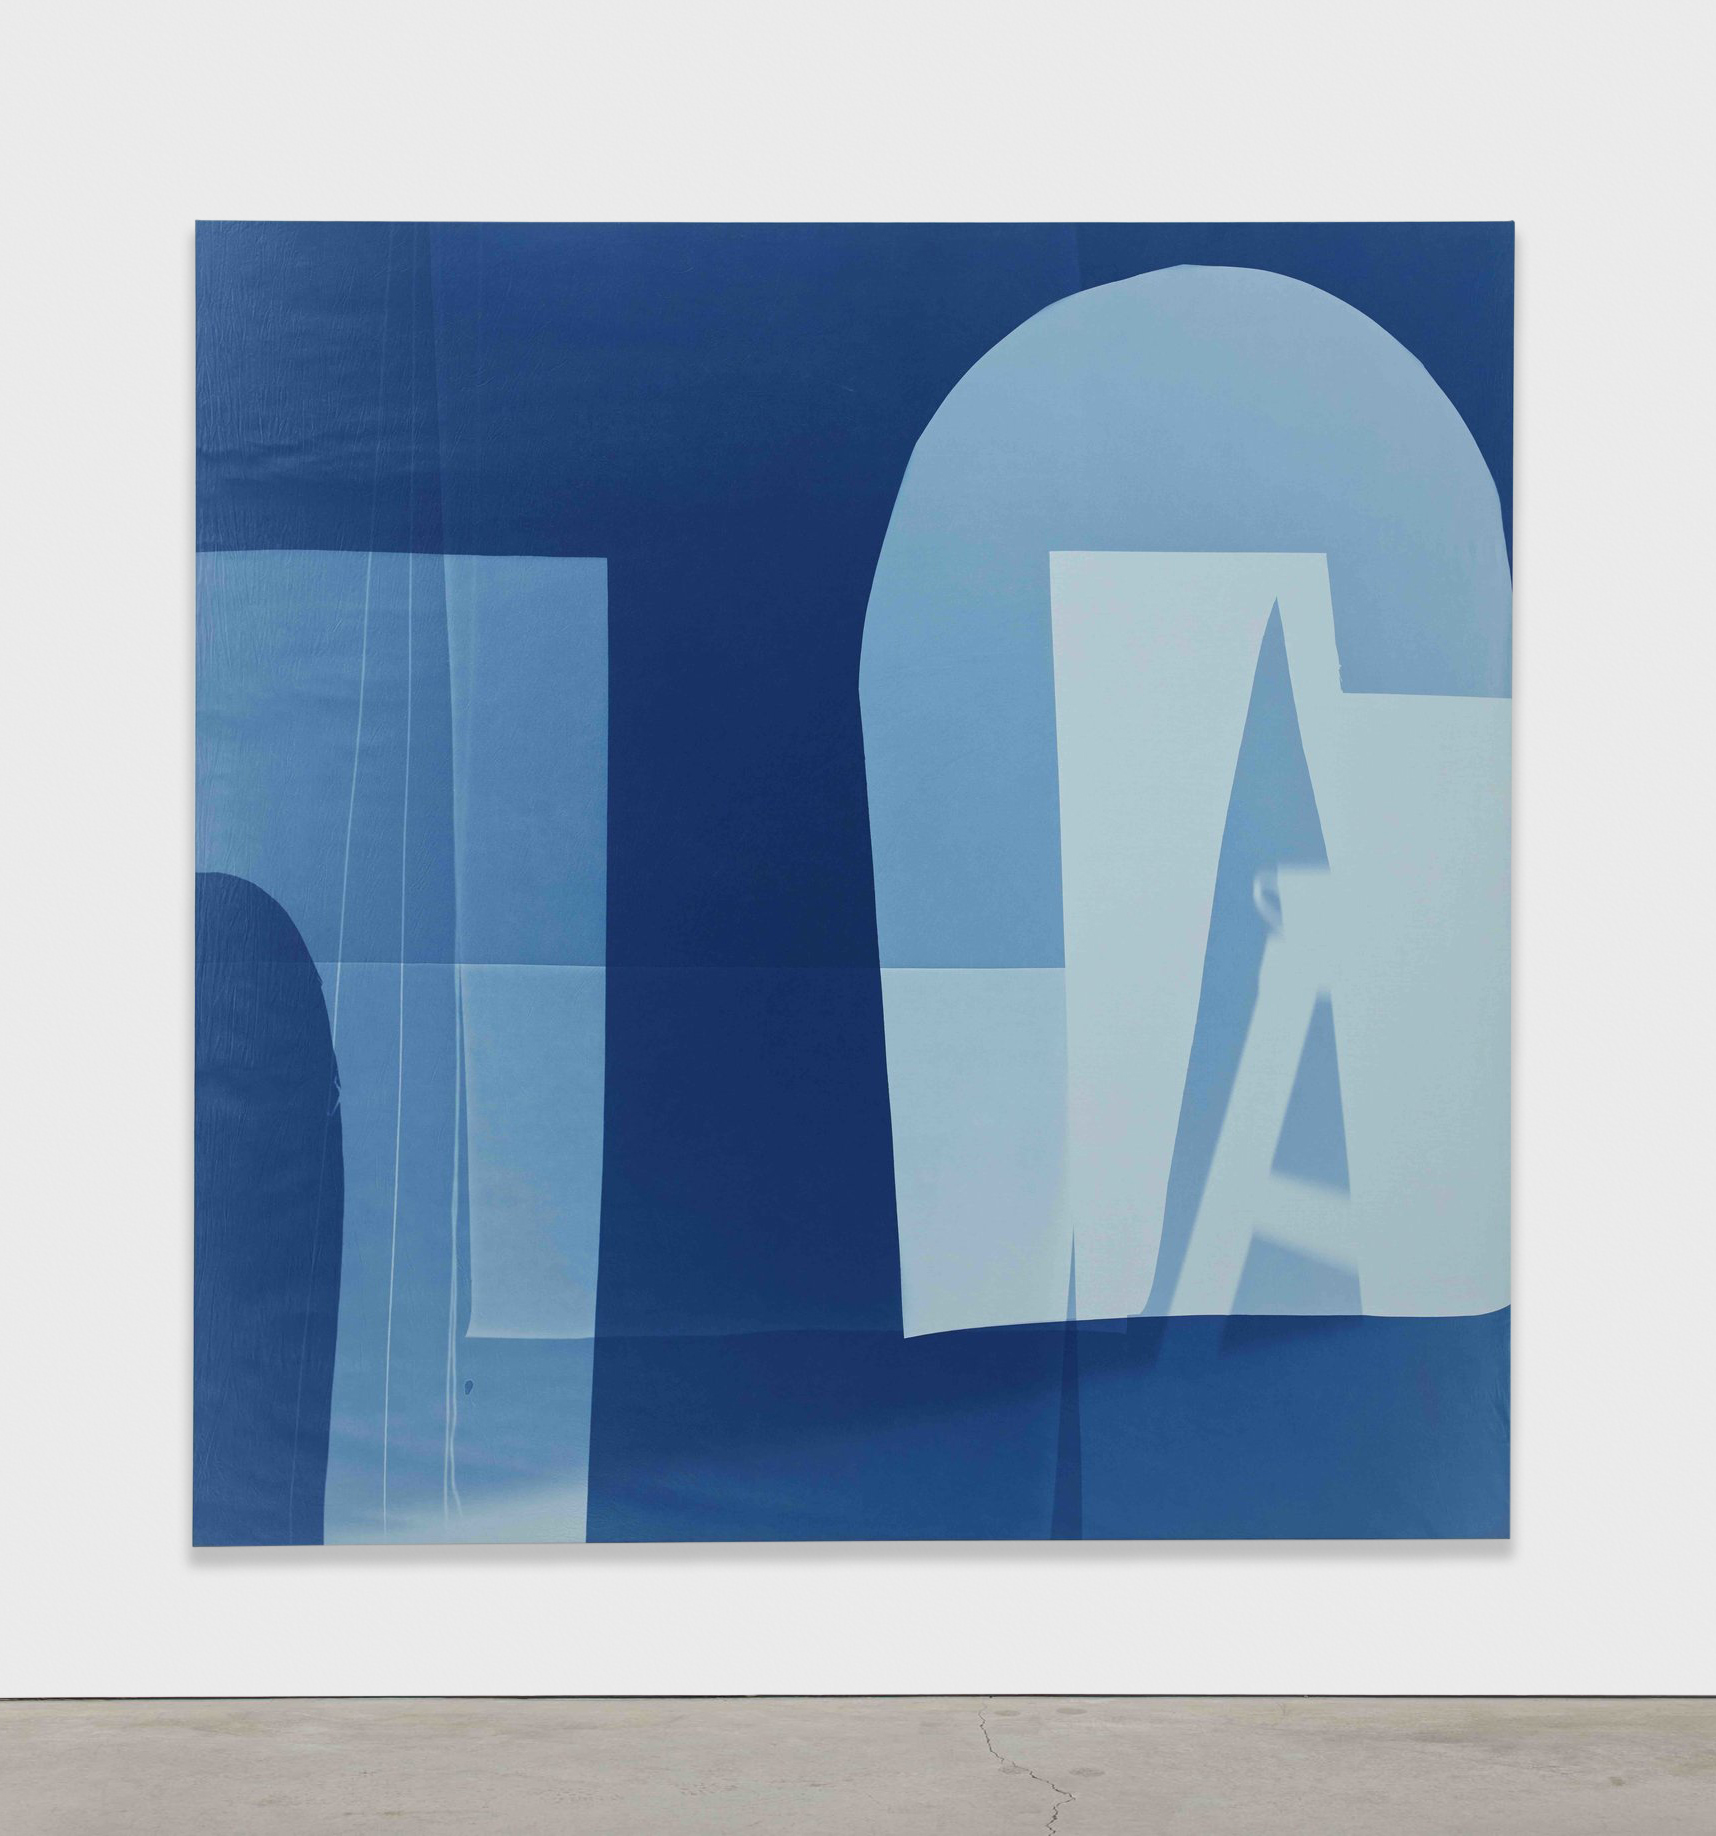 Erin Shirreff  Four strings  2015 Cyanotype photogram, muslin over canvas 96h x 96w in